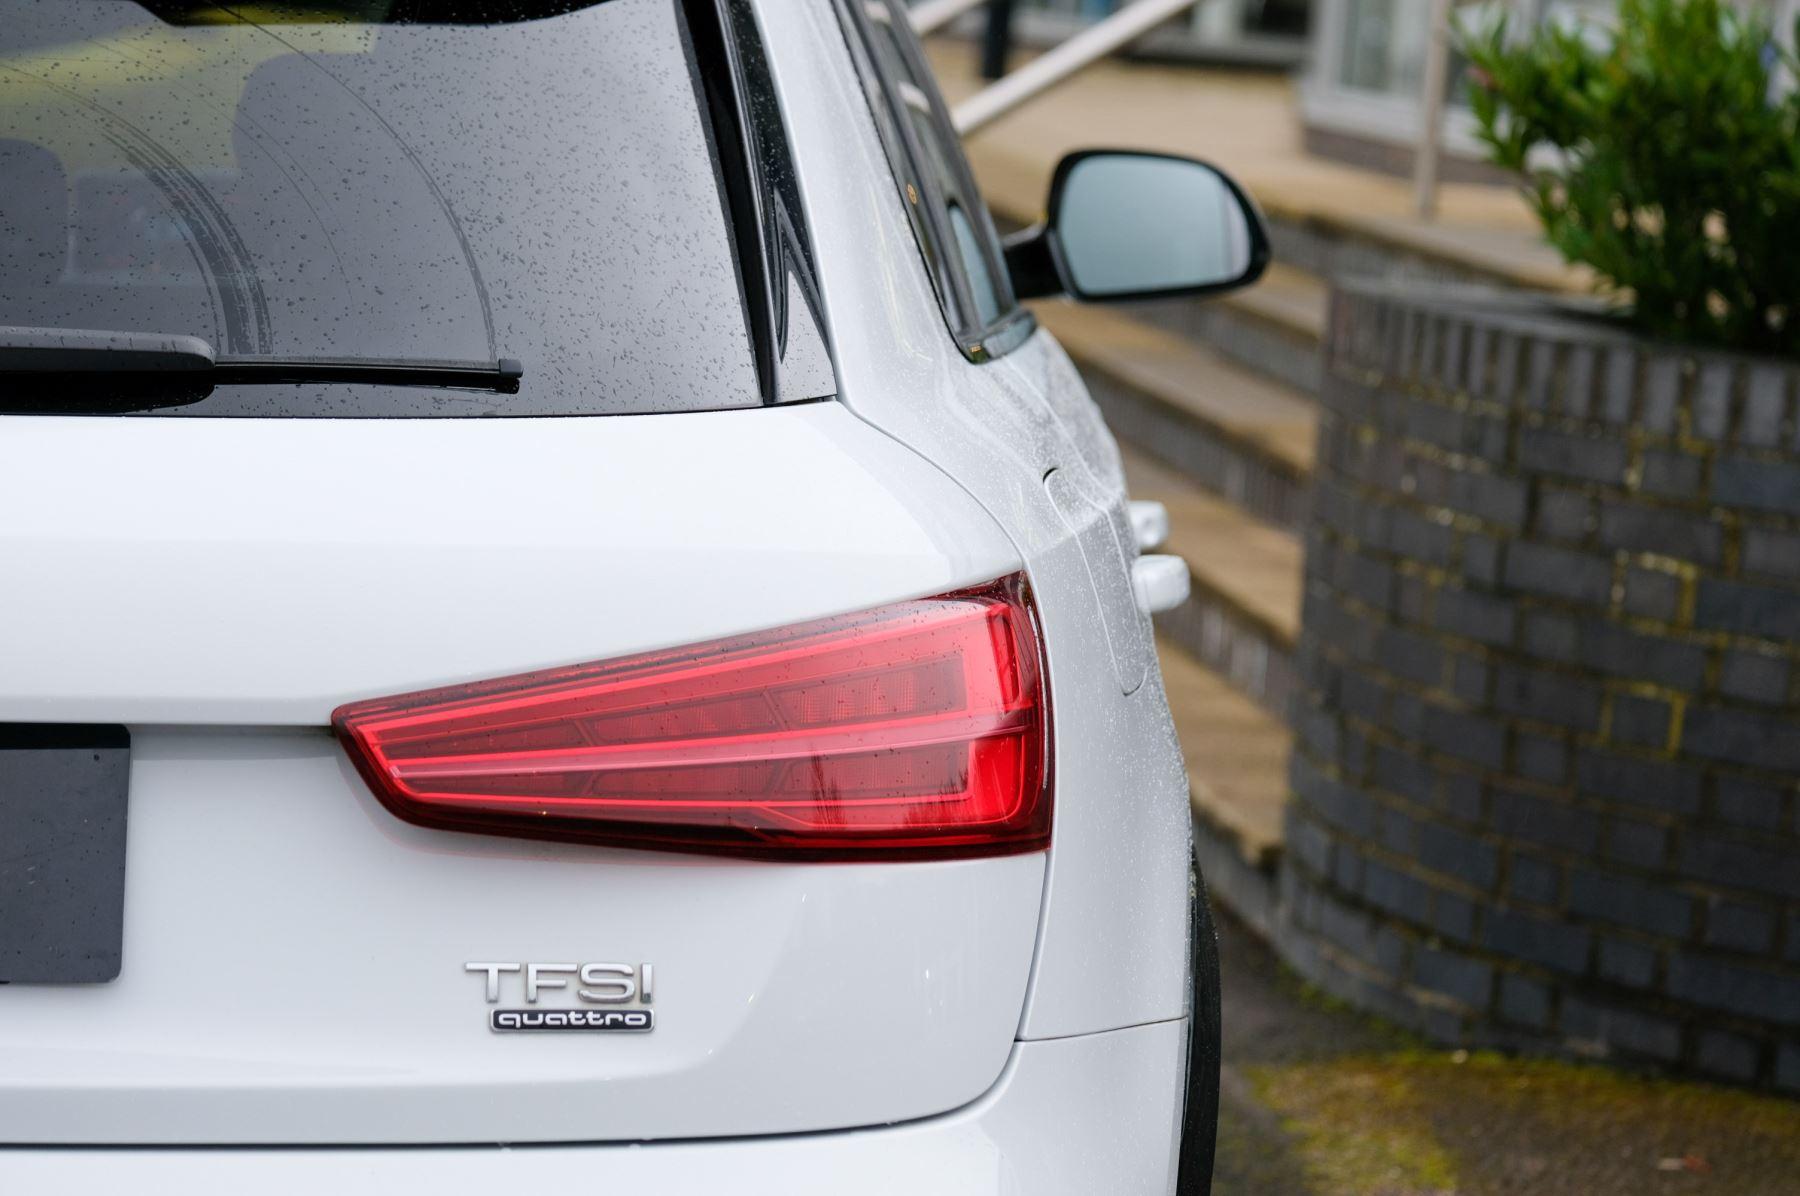 Audi Q3 2.0T FSI Quattro Black Edition 5dr S Tronic - Panoramic glass sunroof image 12